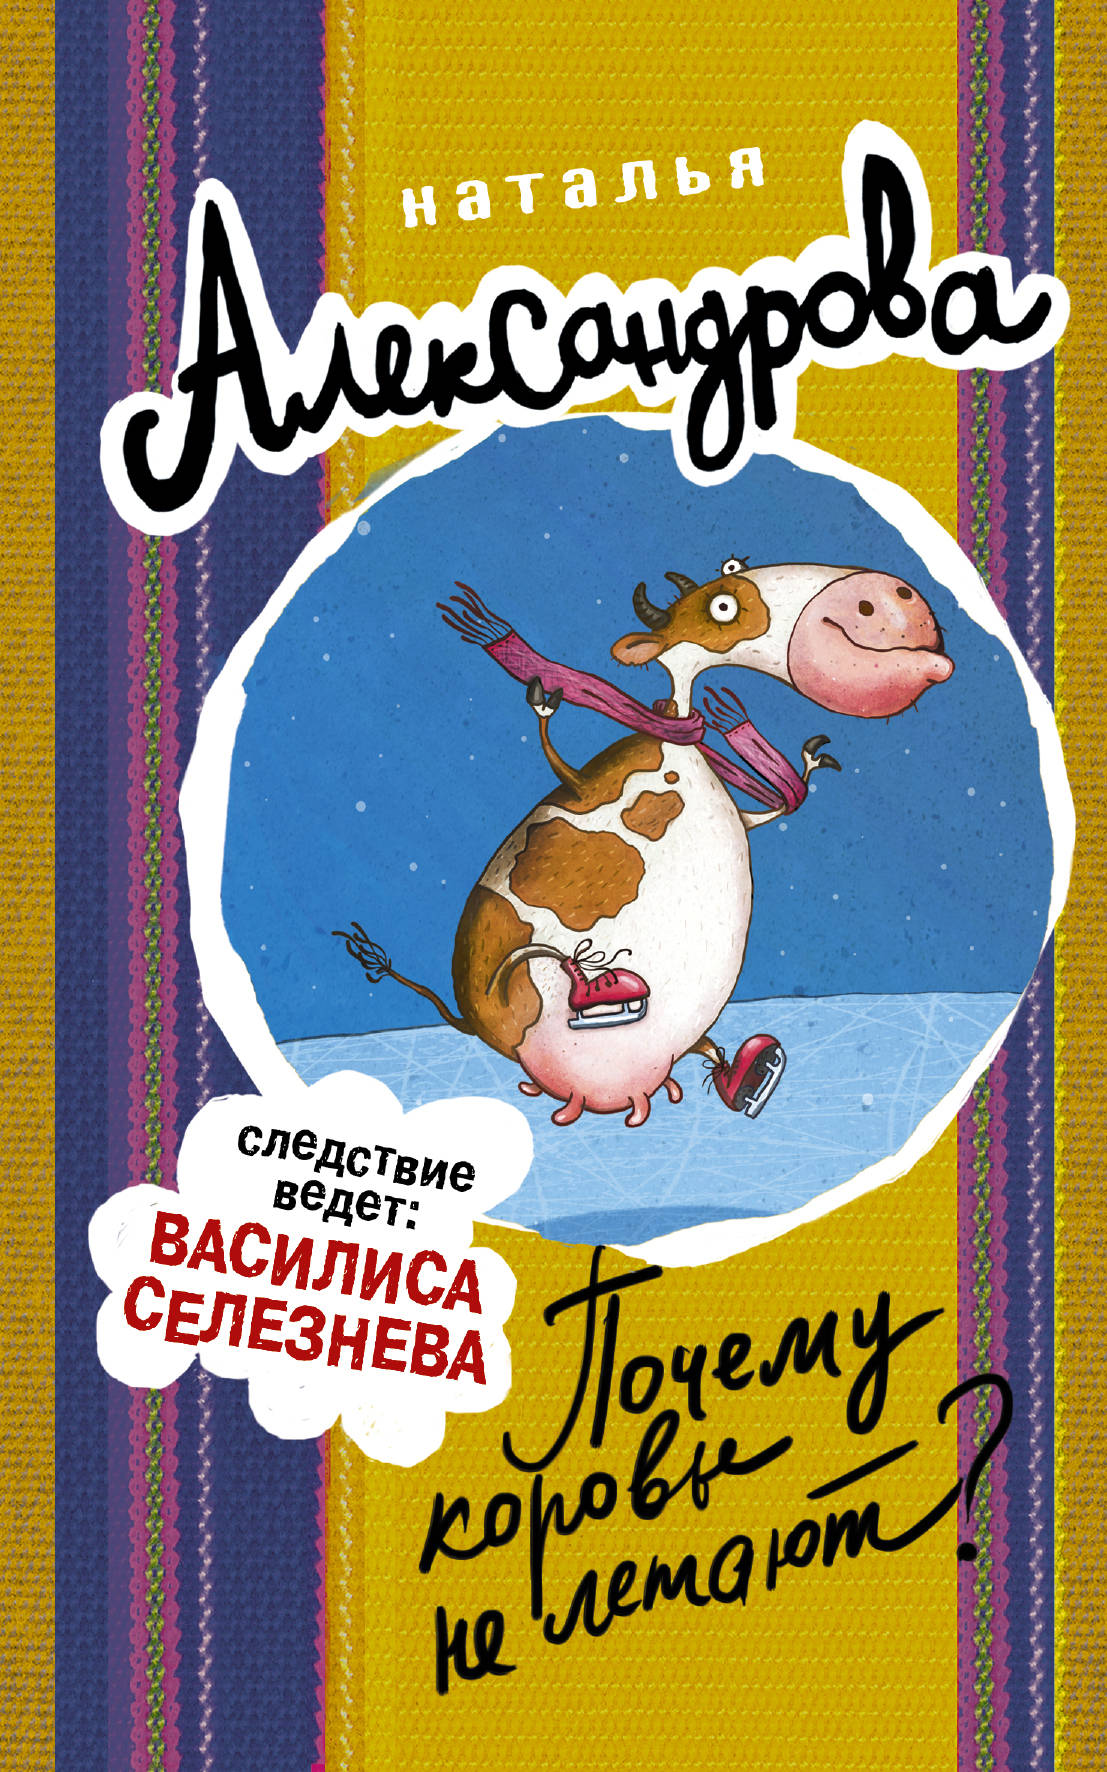 Наталья Александрова Почему коровы не летают?